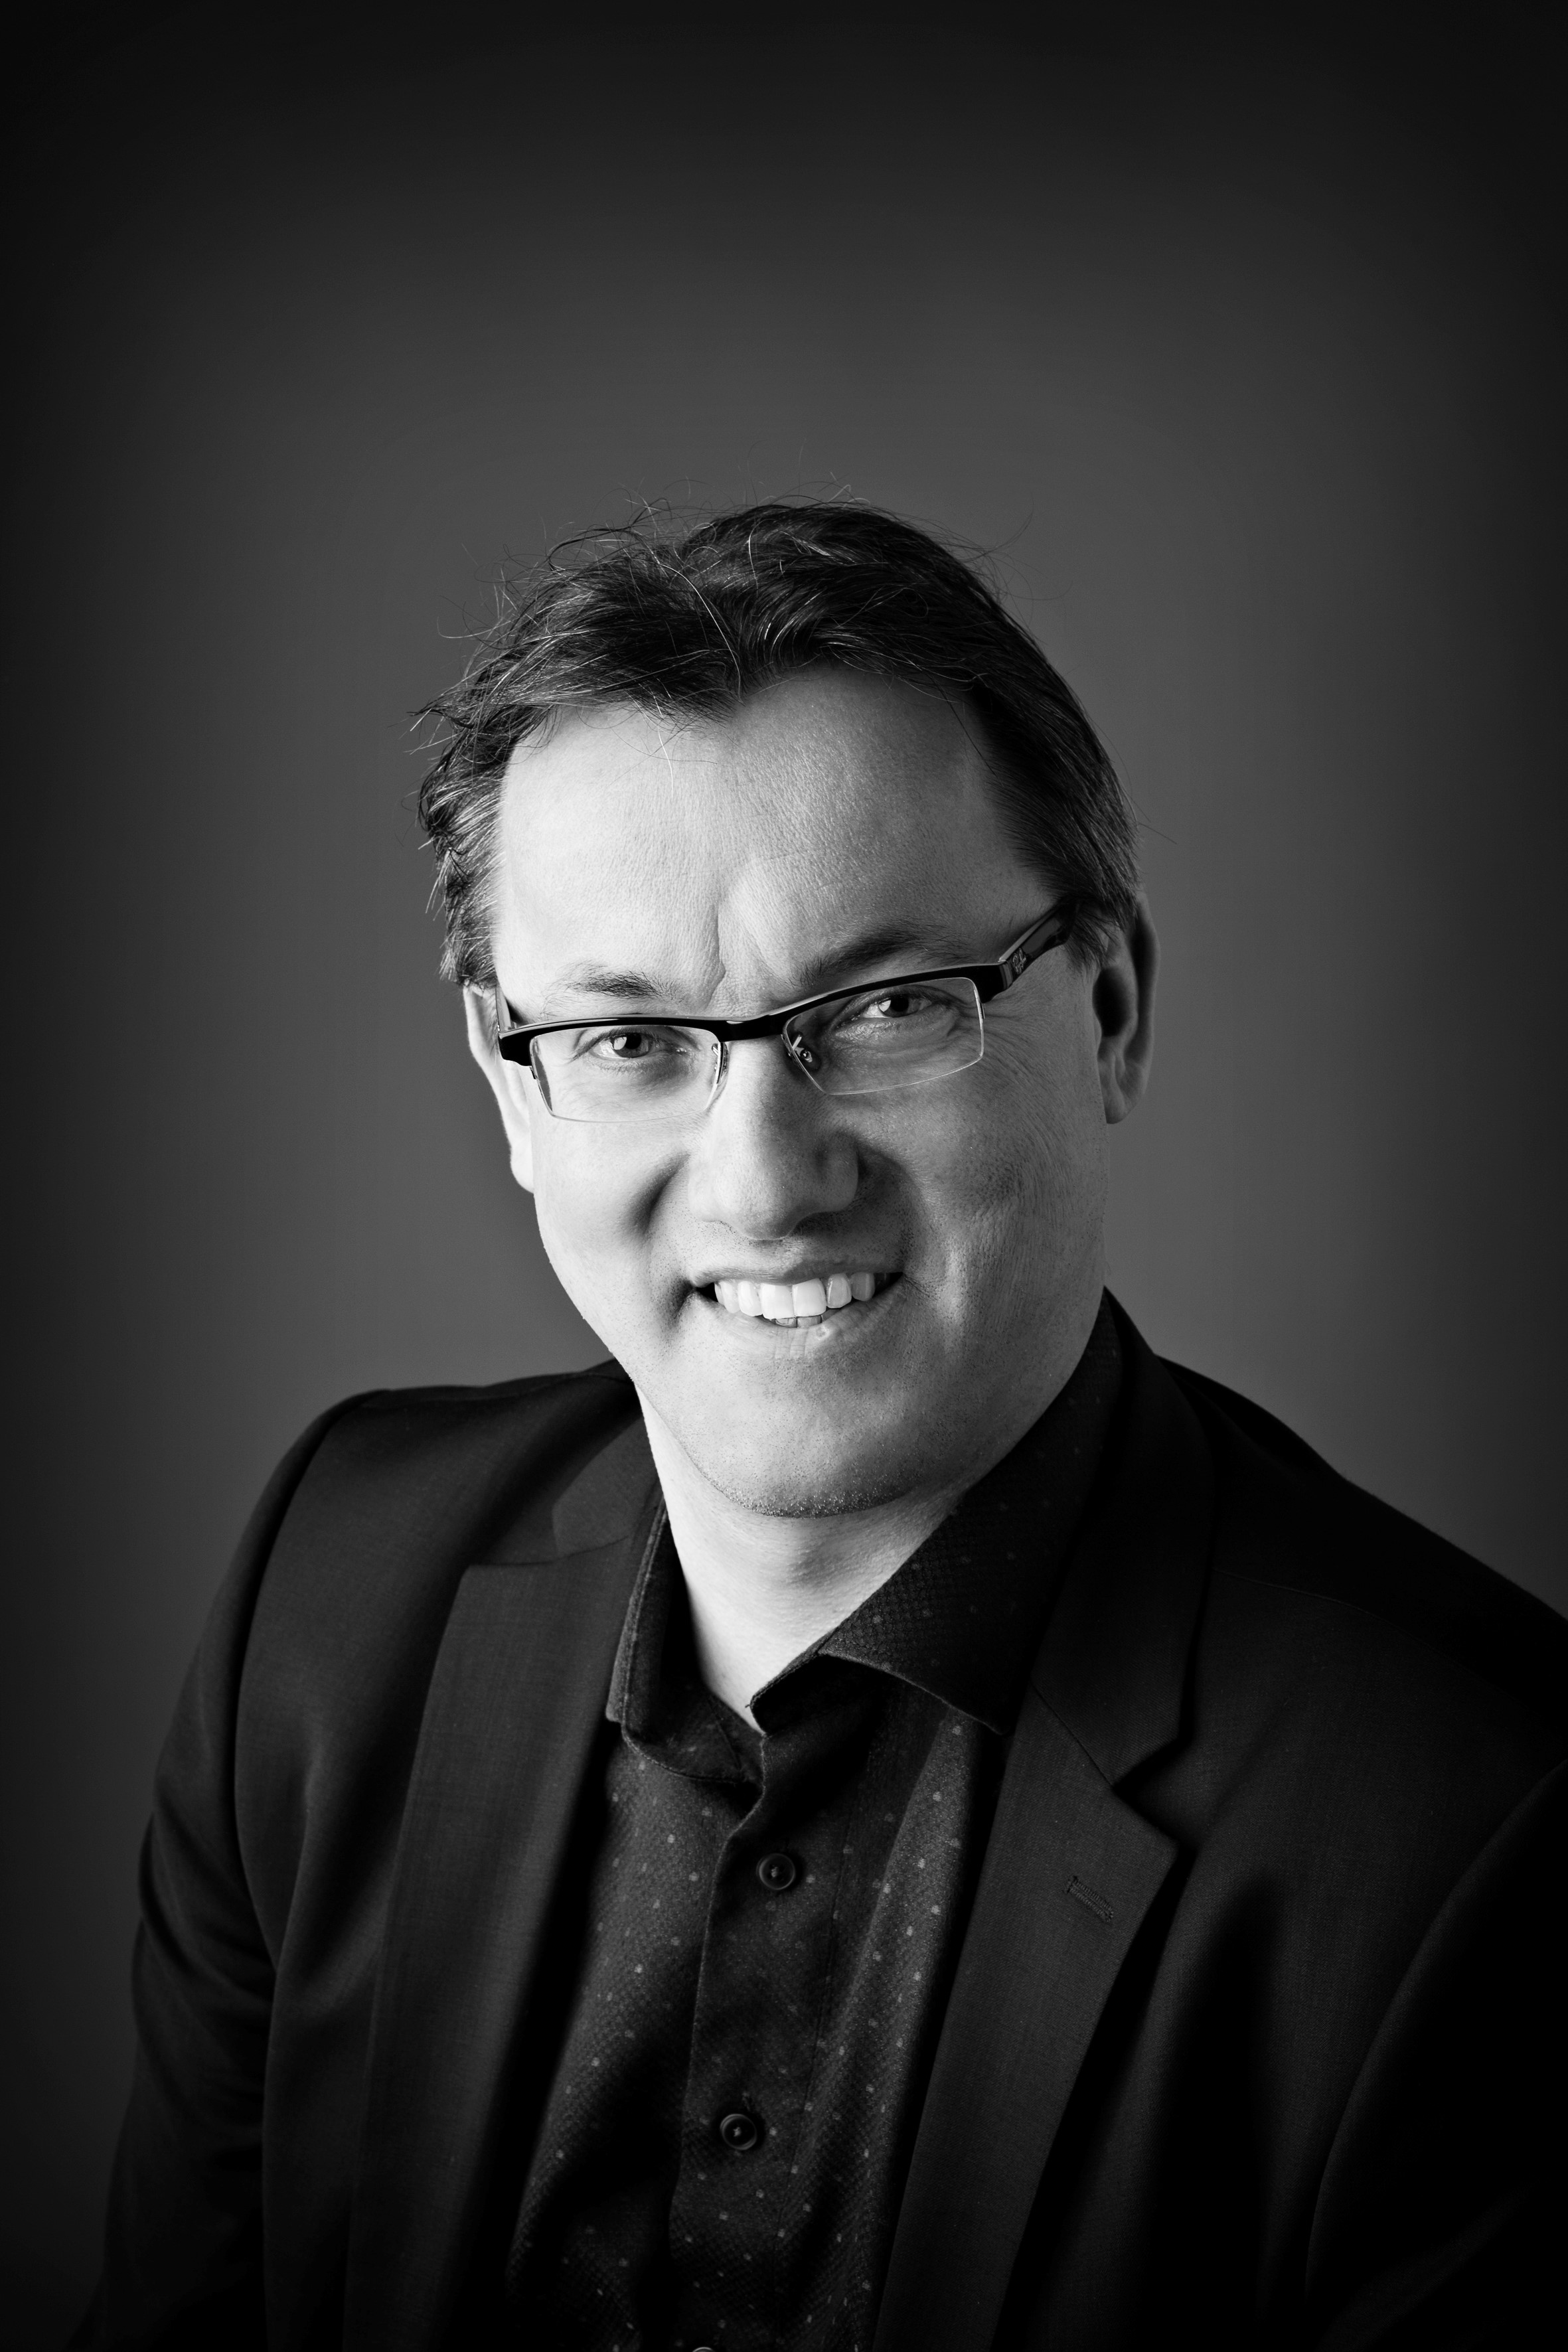 Luc Deraedt versterkt de FranchiseFormules Adviestak vanuit Moorsele, België. Bron: FranchiseFormules.NL